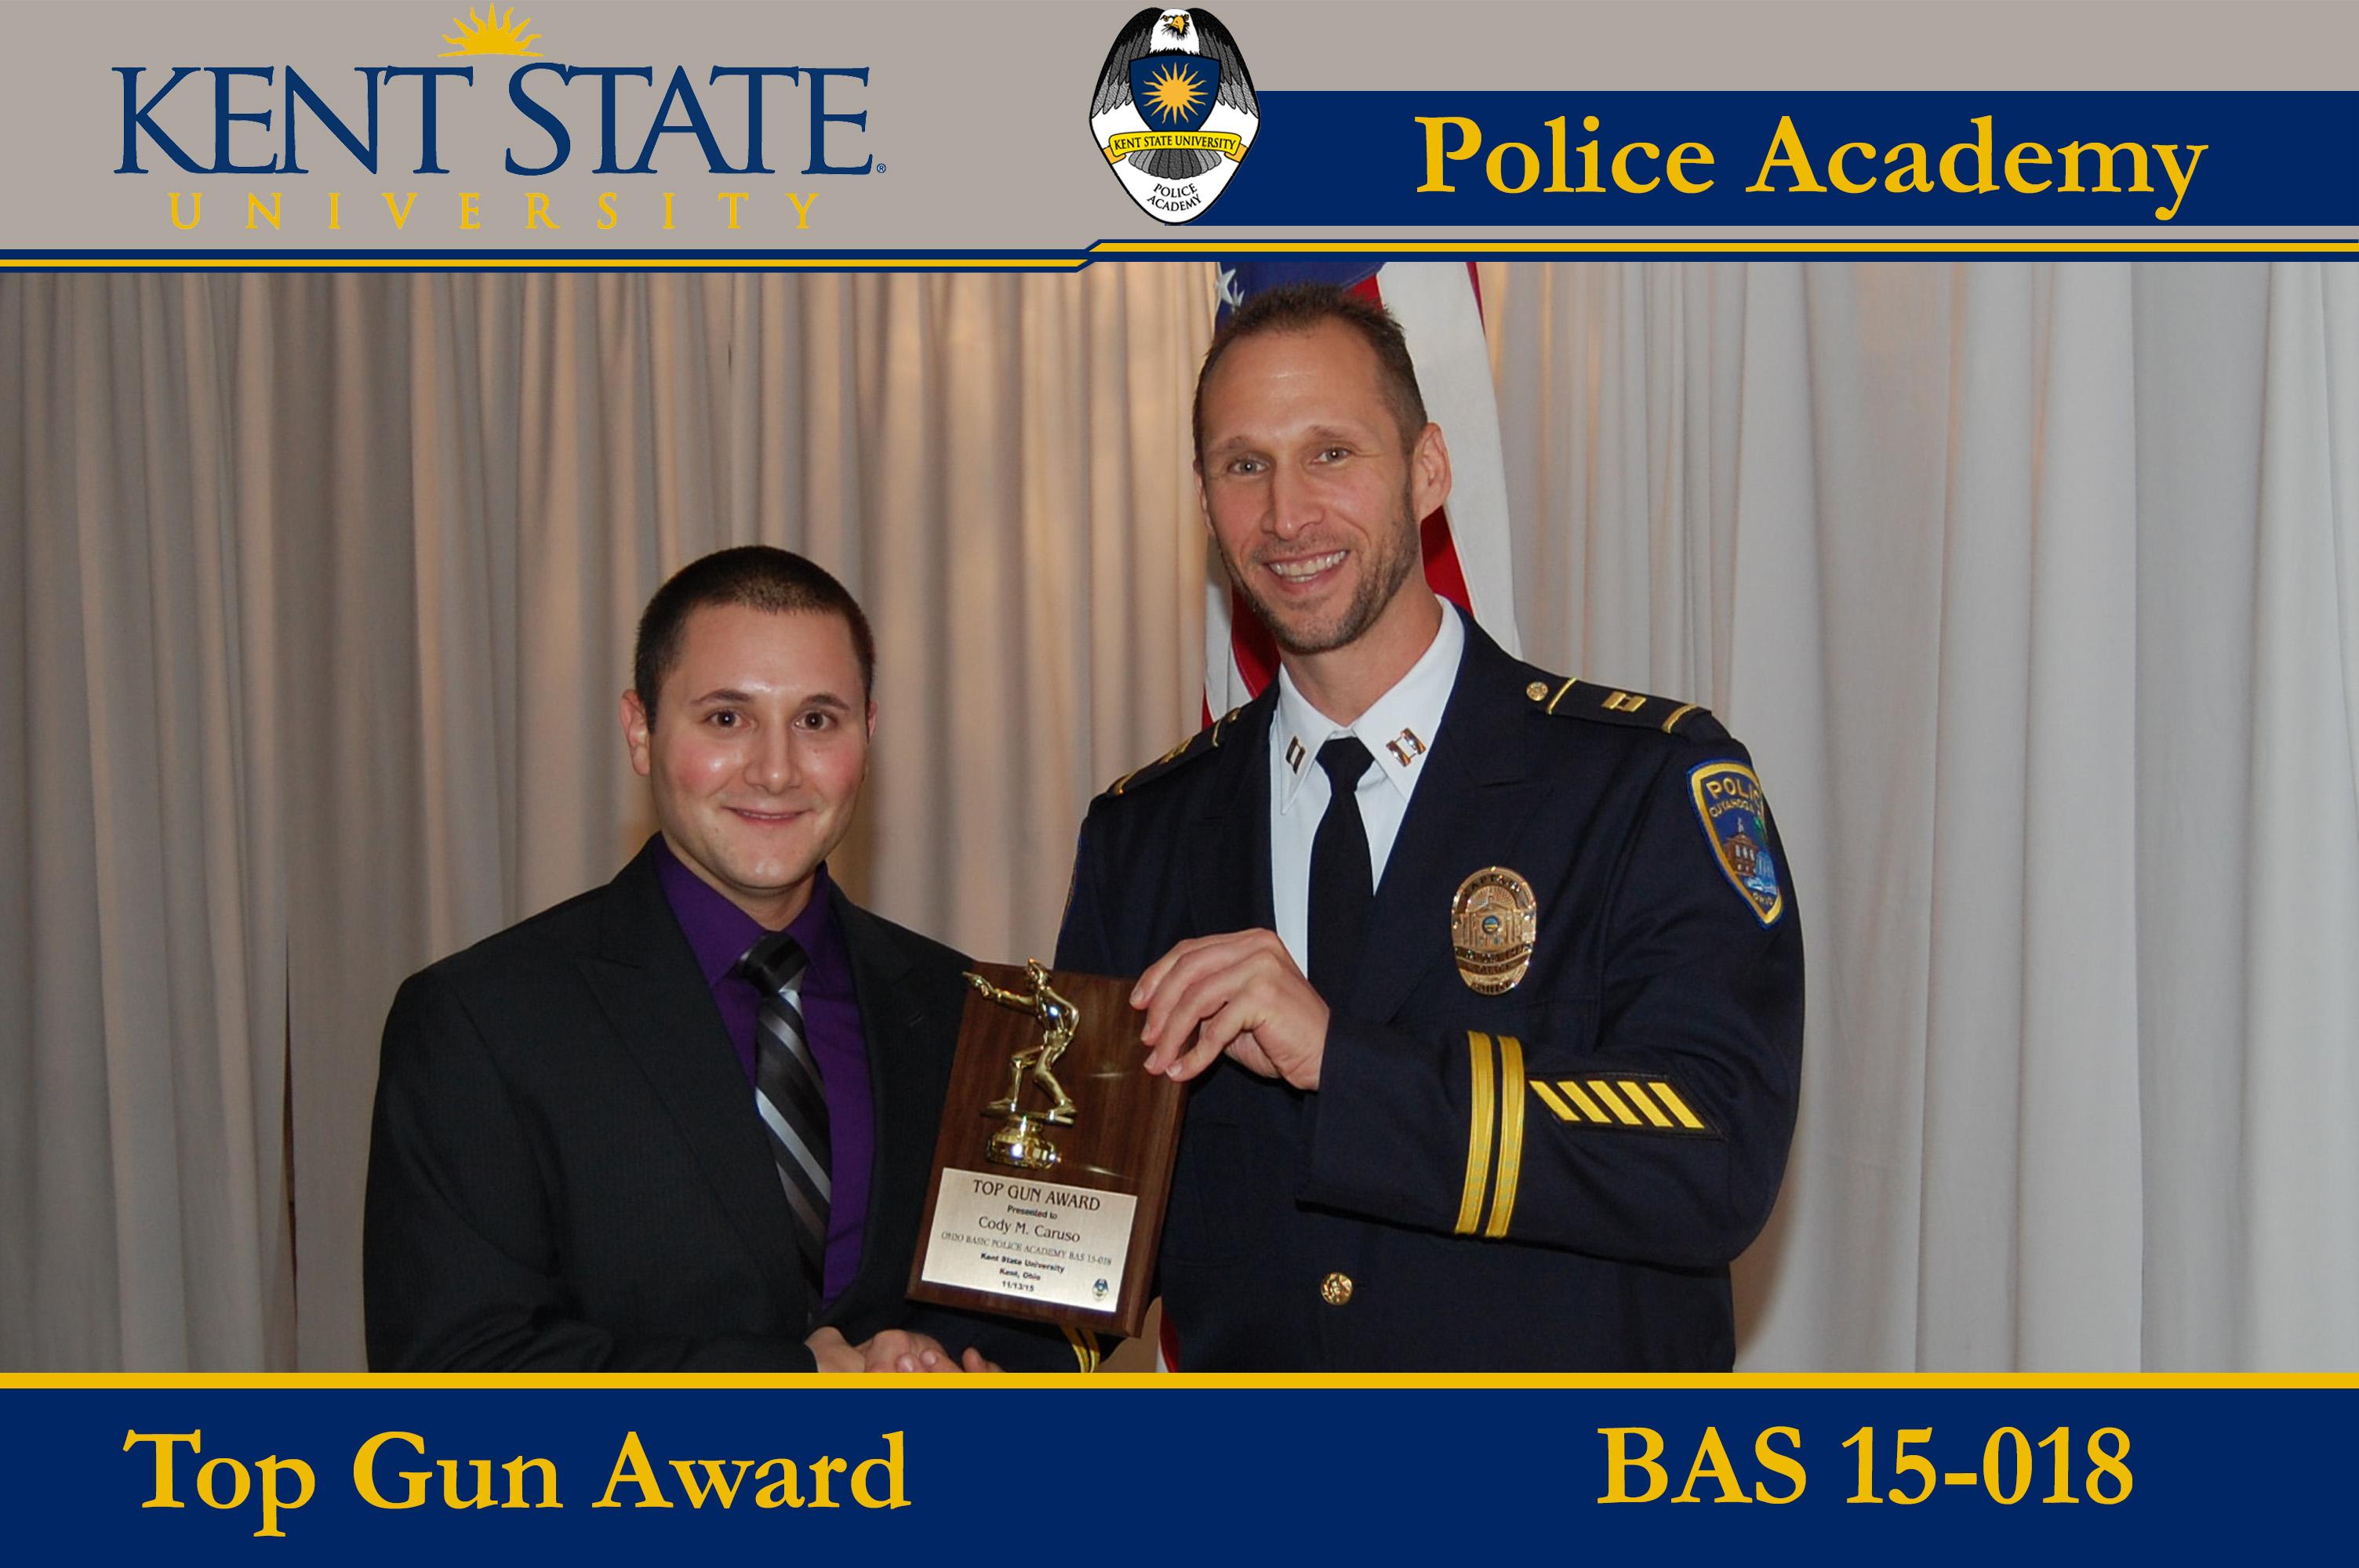 Cadet Receiving Top Gun Award BAS 15-018